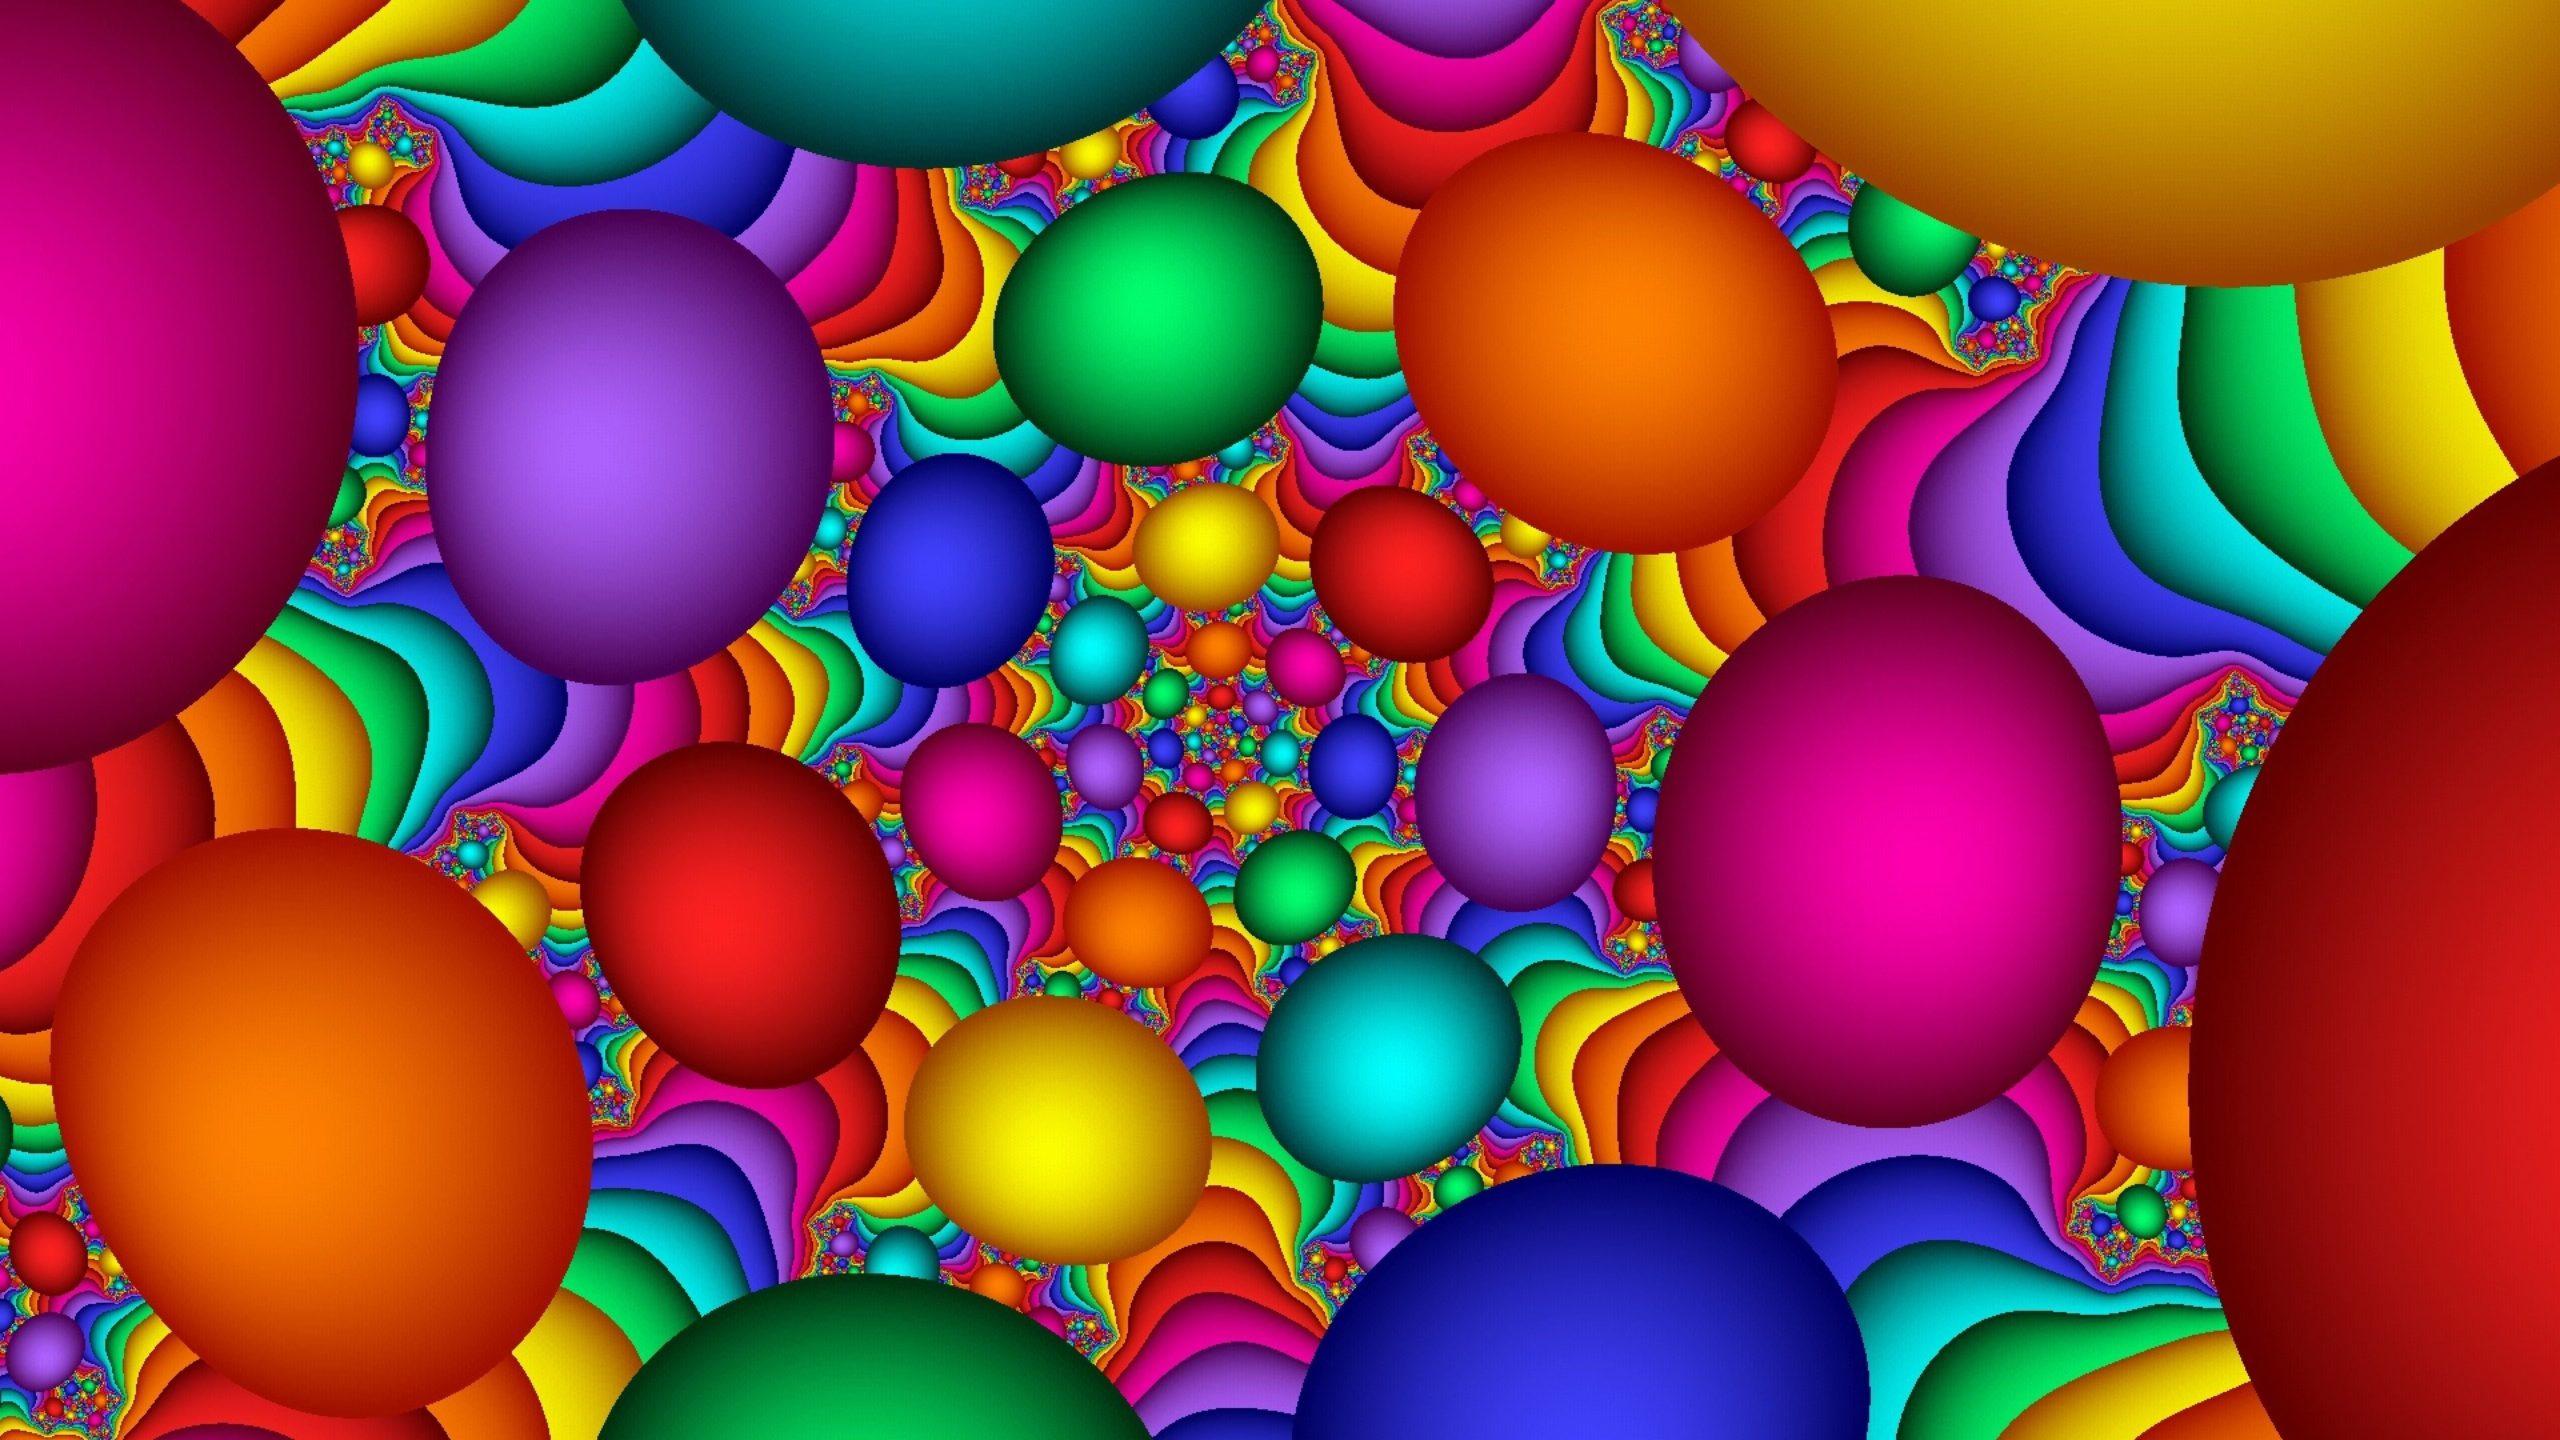 colour wallpaper download